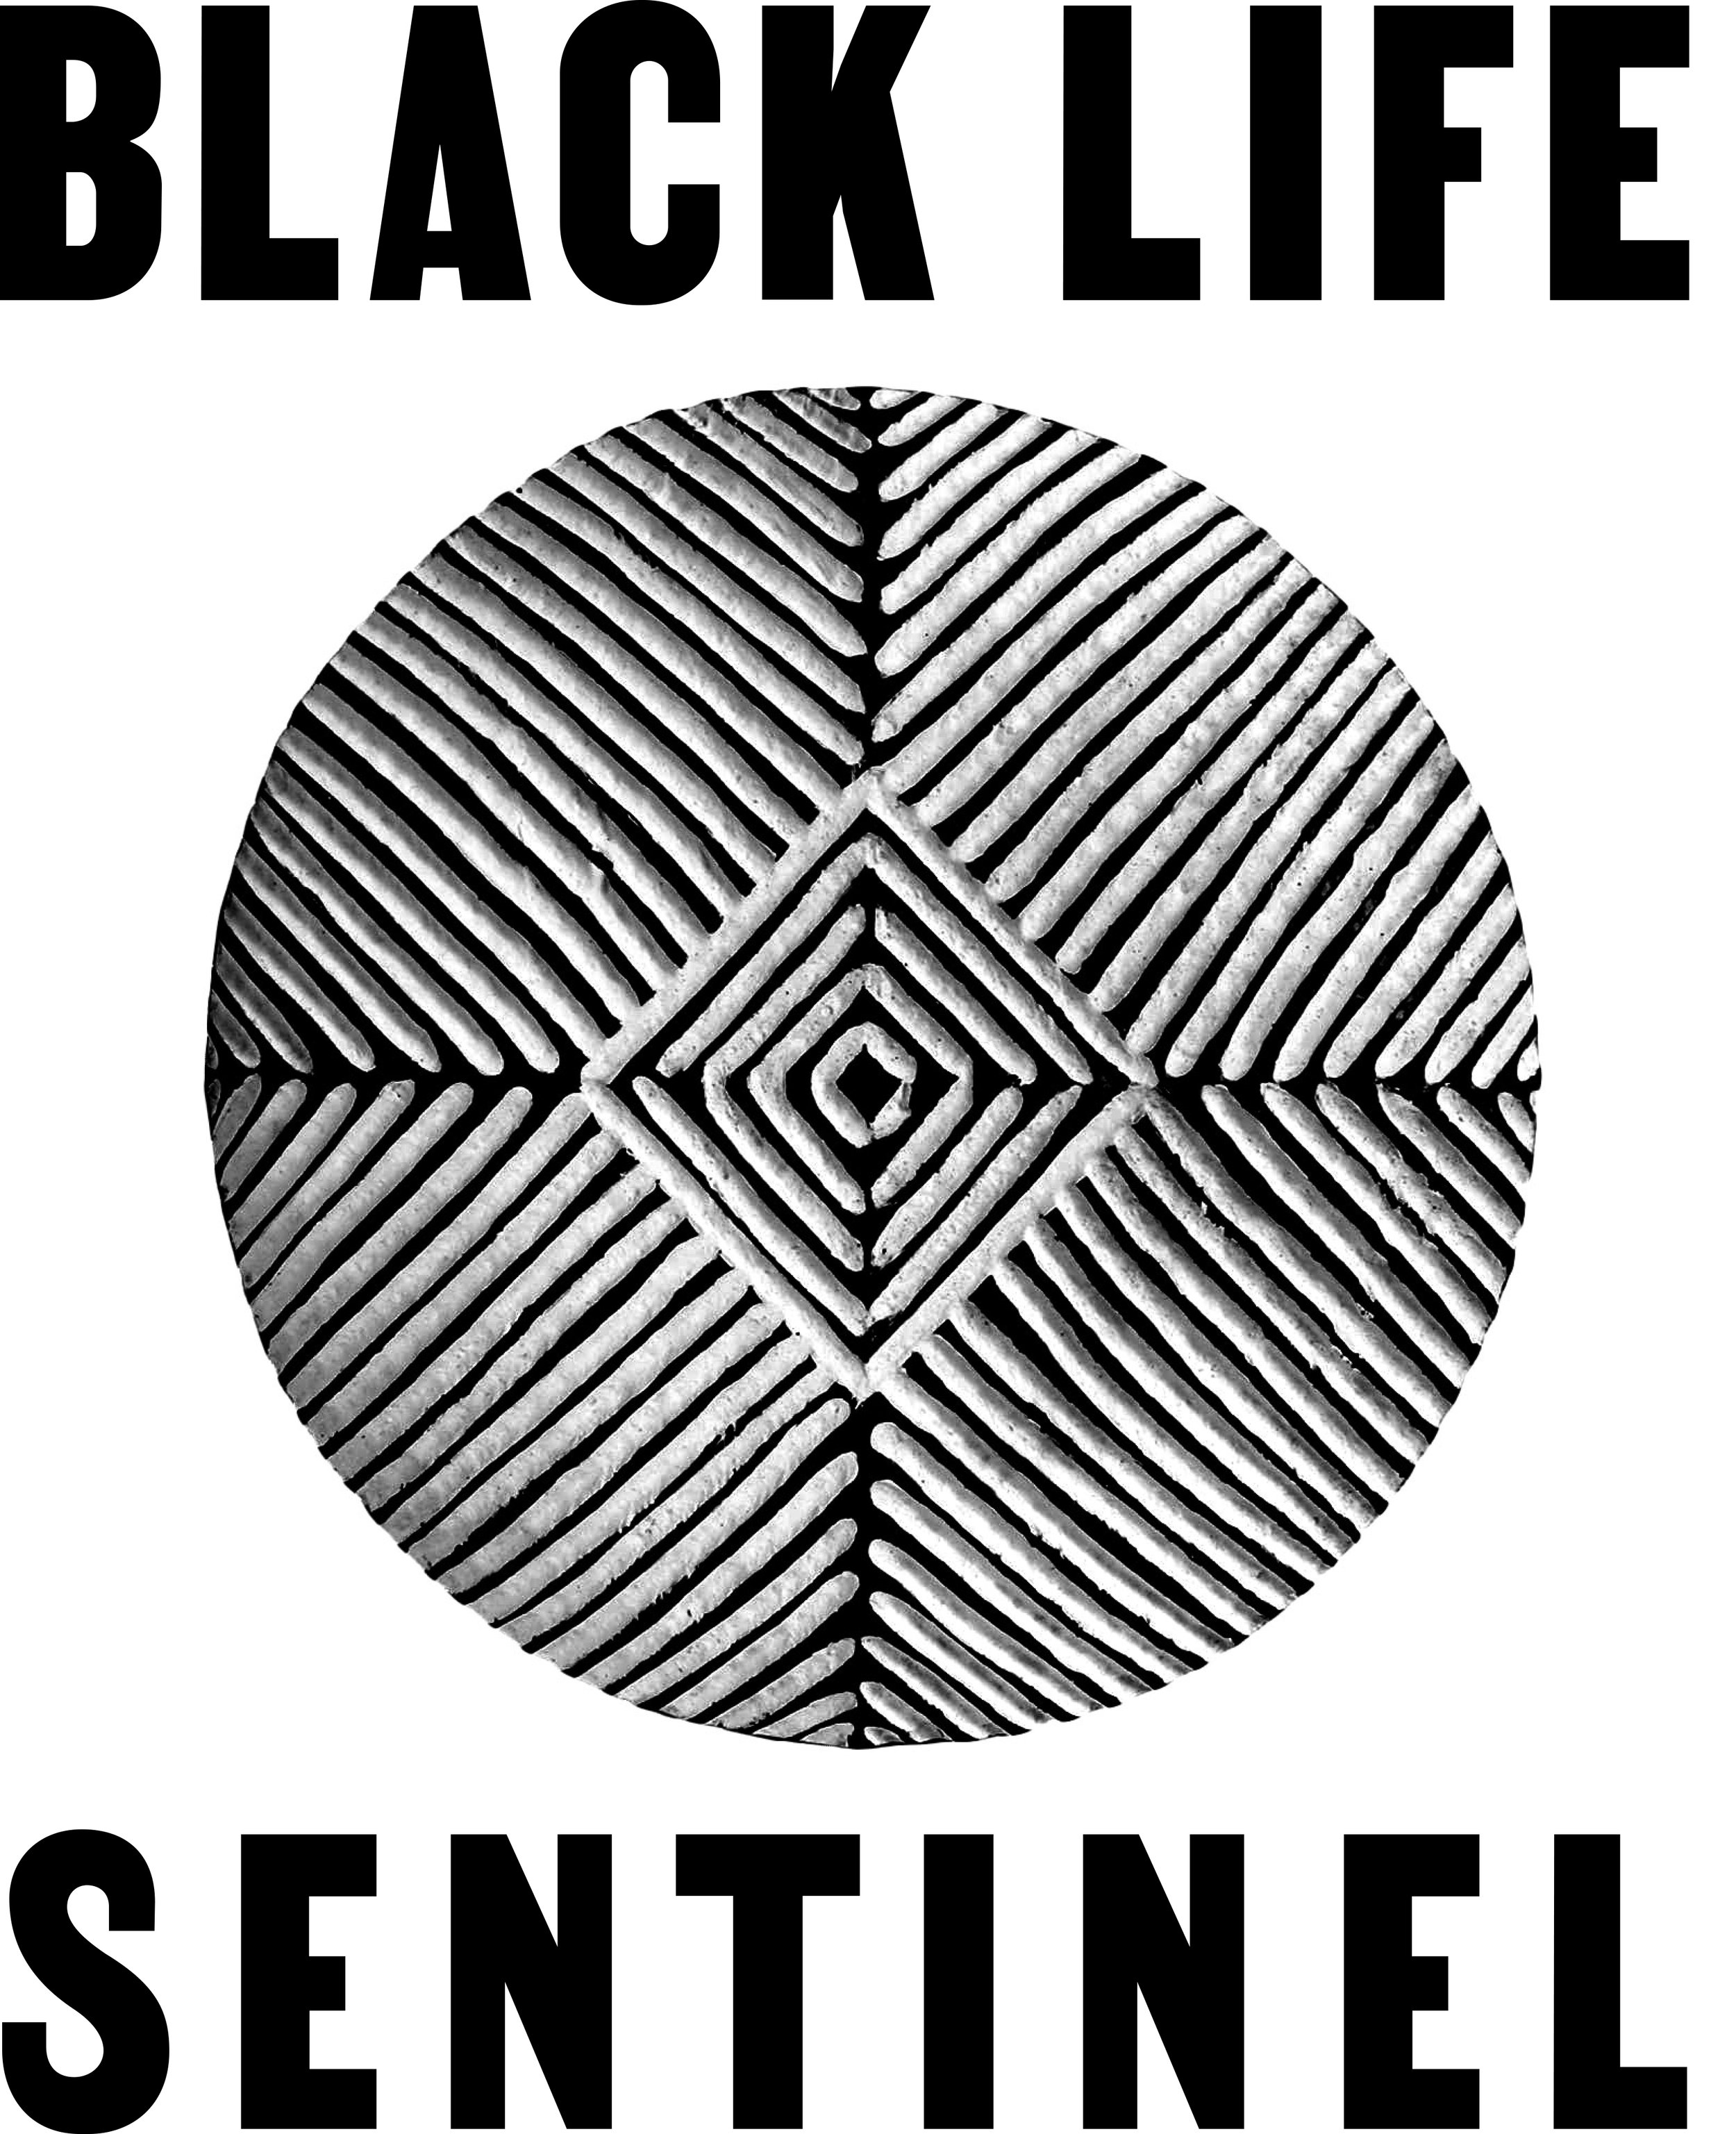 Black Life Sentinel.jpg